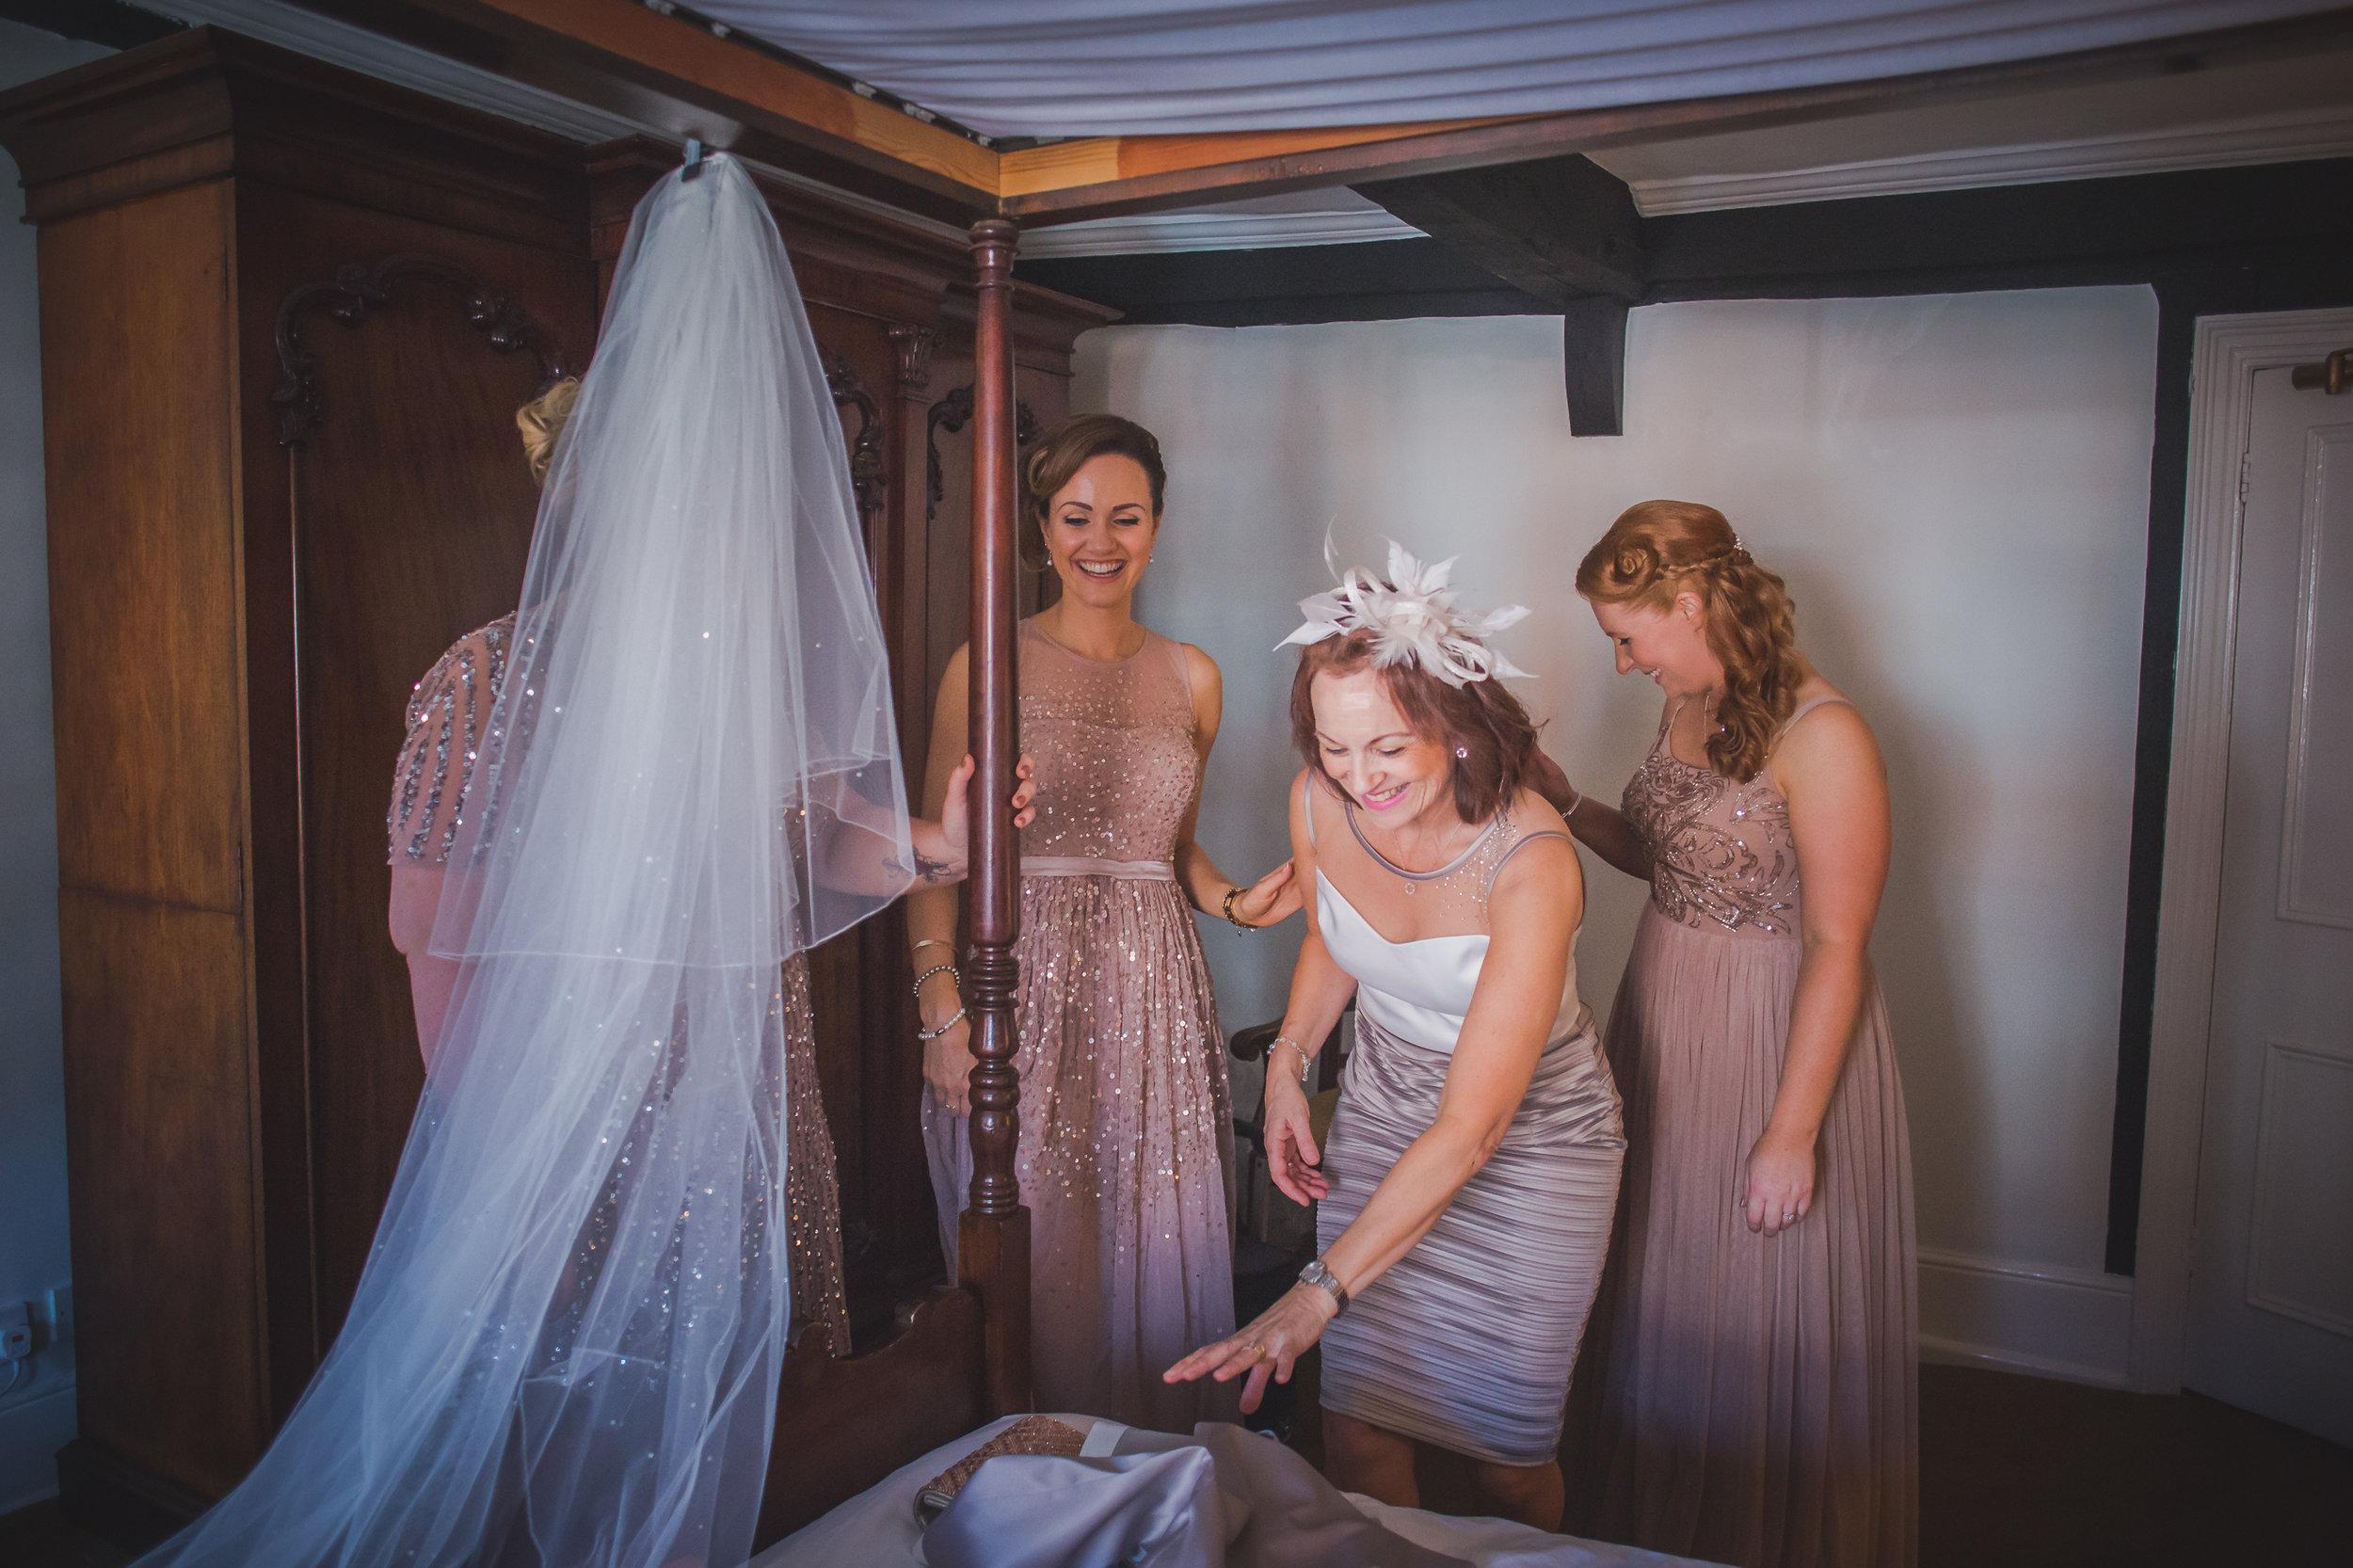 Grittenham Barn female wedding photographers west sussex petworth social-11.jpg